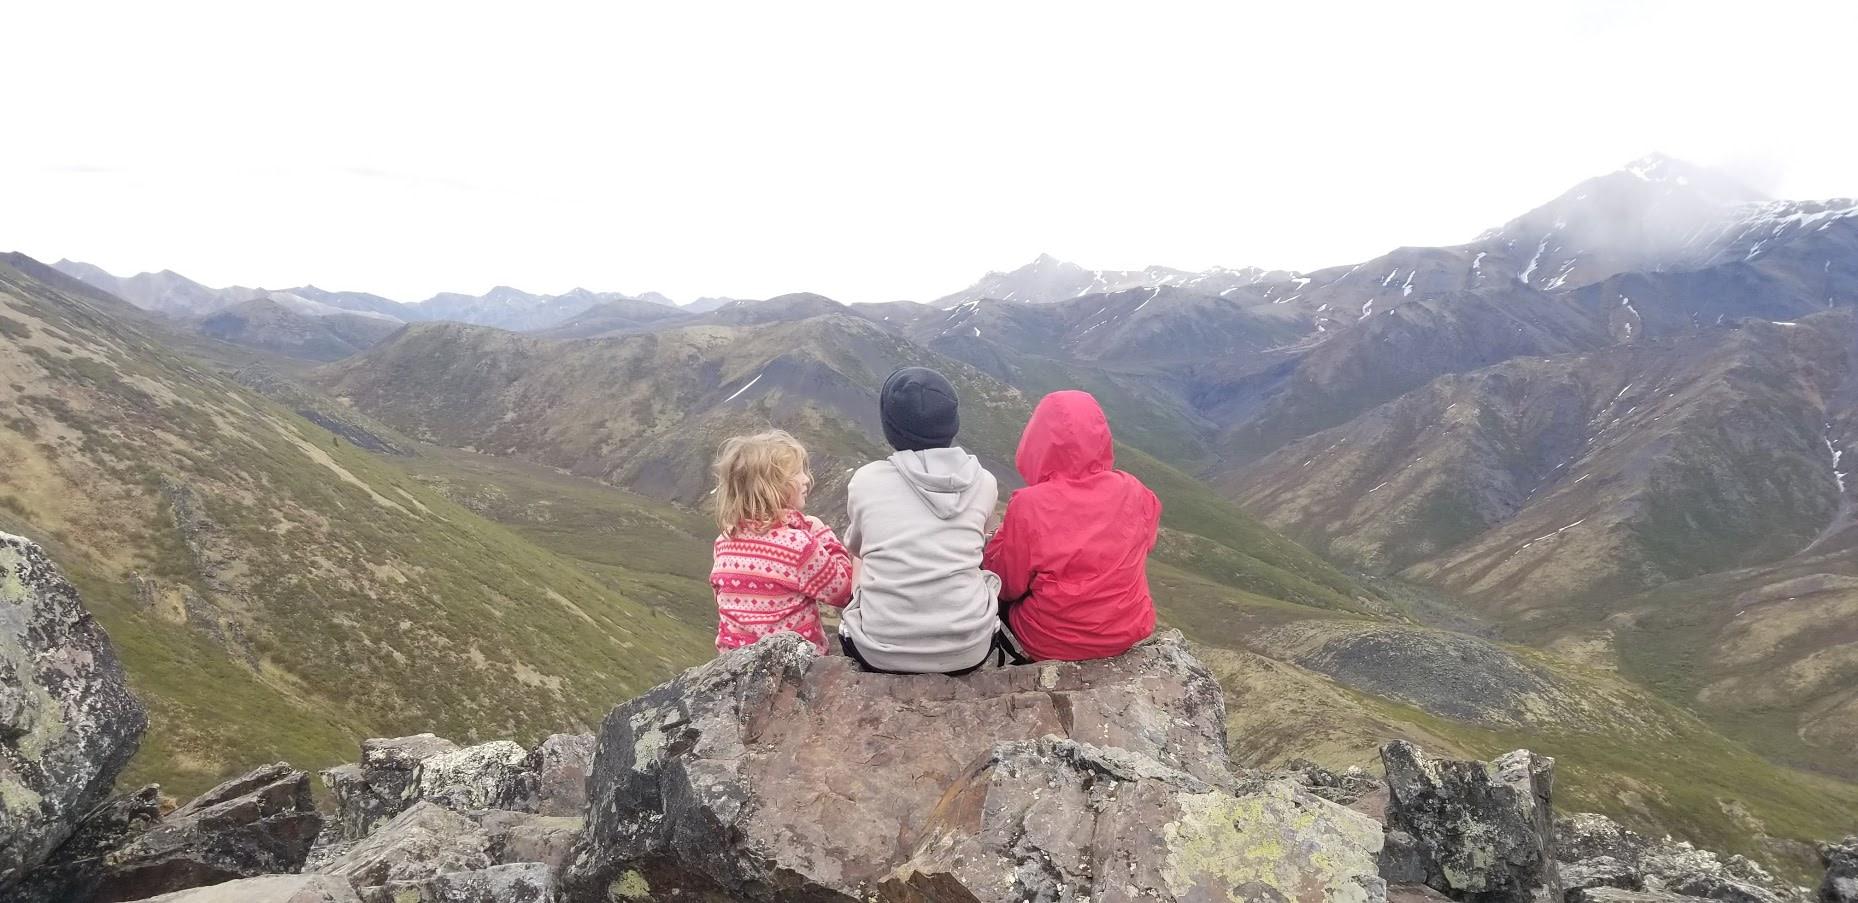 2020 ROAM Alaska Rally - Fulltime Families